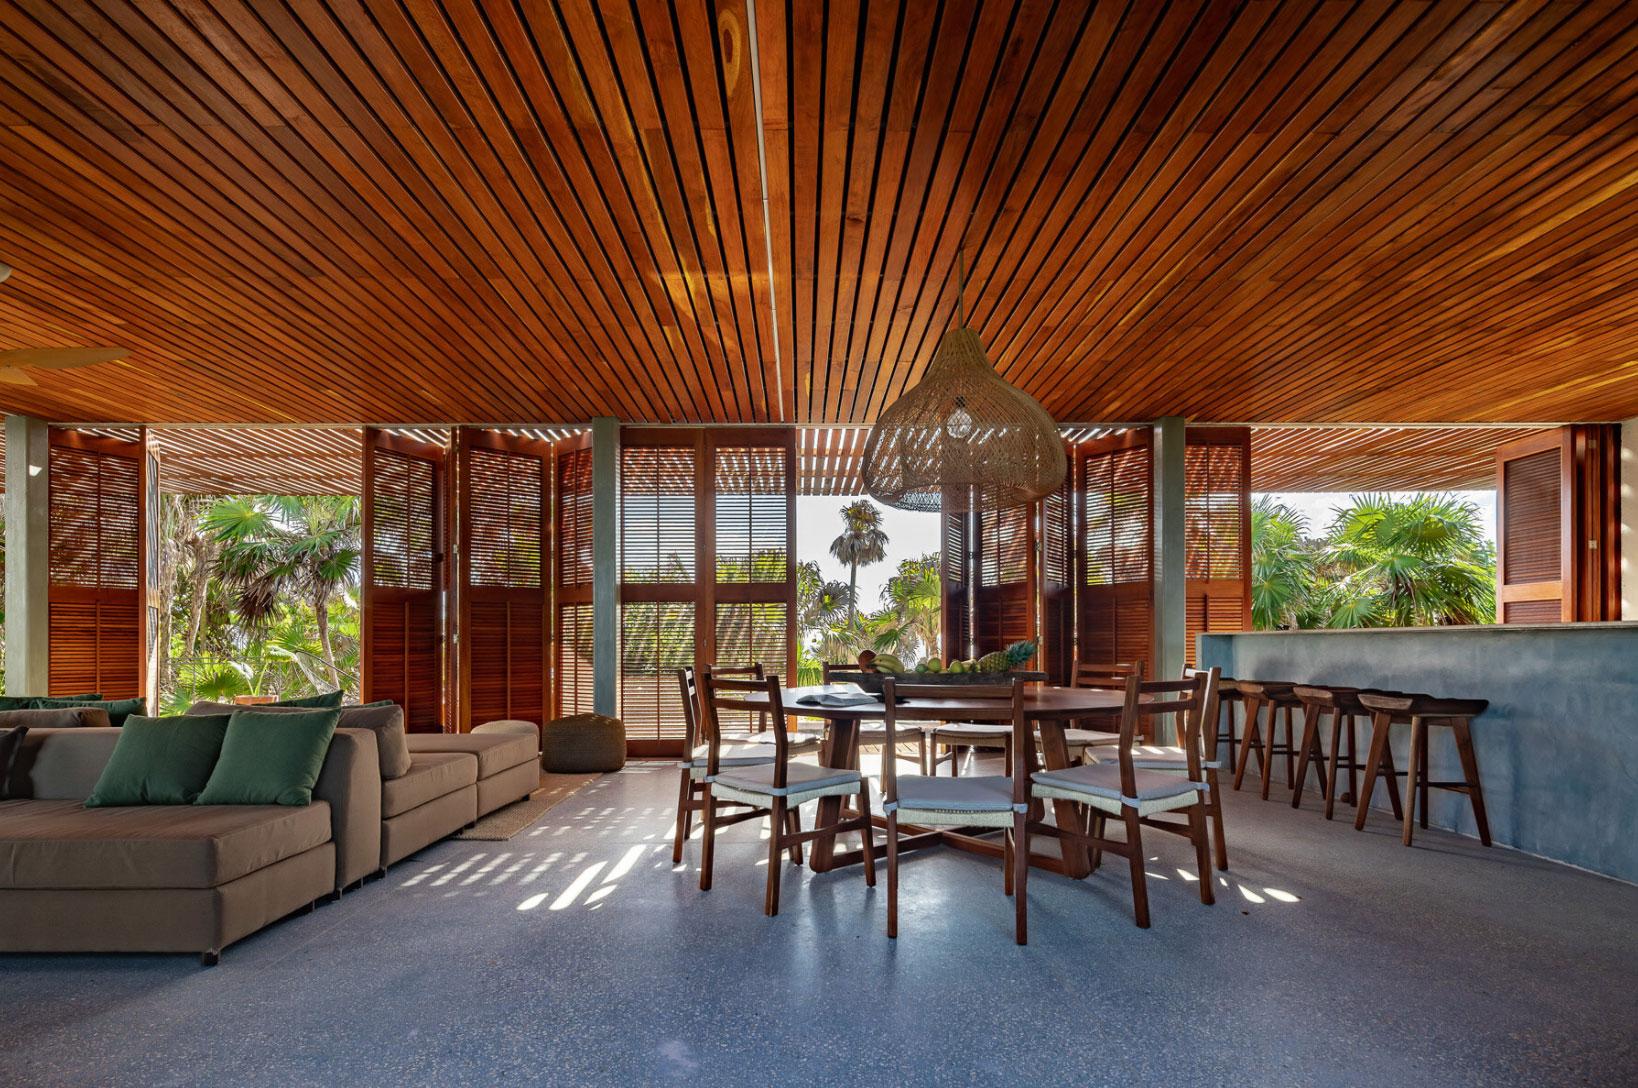 Casa Bautista - a jungle hideaway in Yucatan's Sian Ka'an Biosphere Reserve